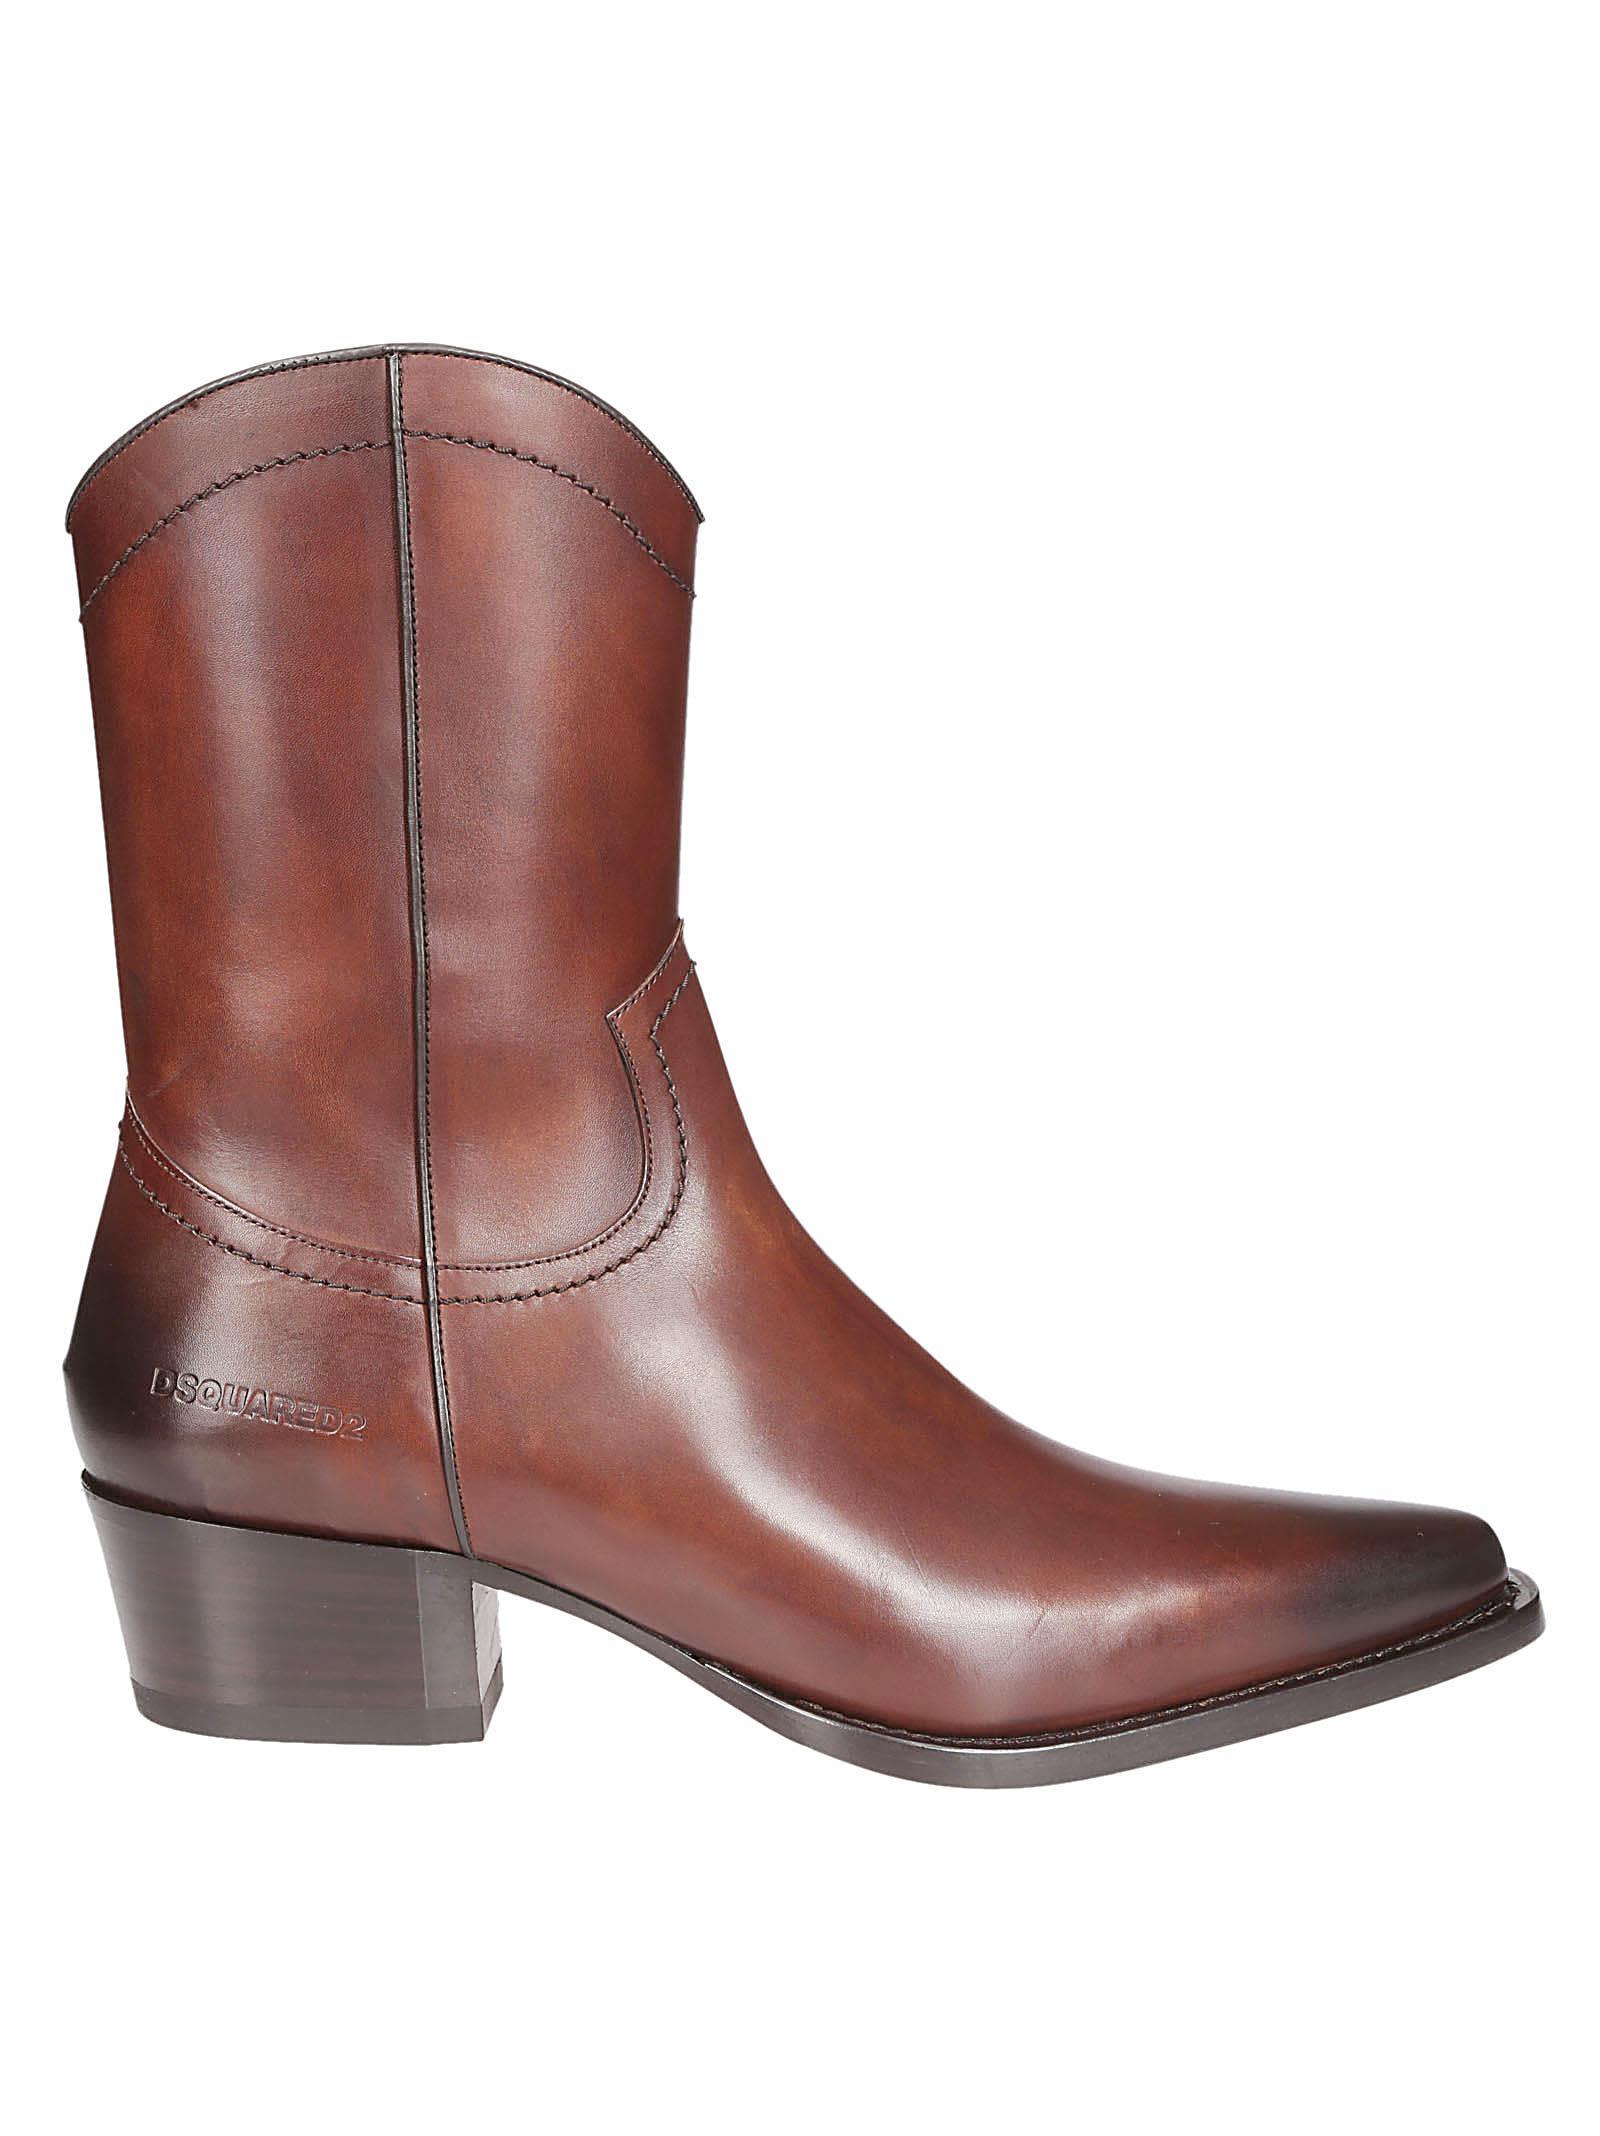 Dsquared2 Hippie Cowboy Arizona Boots